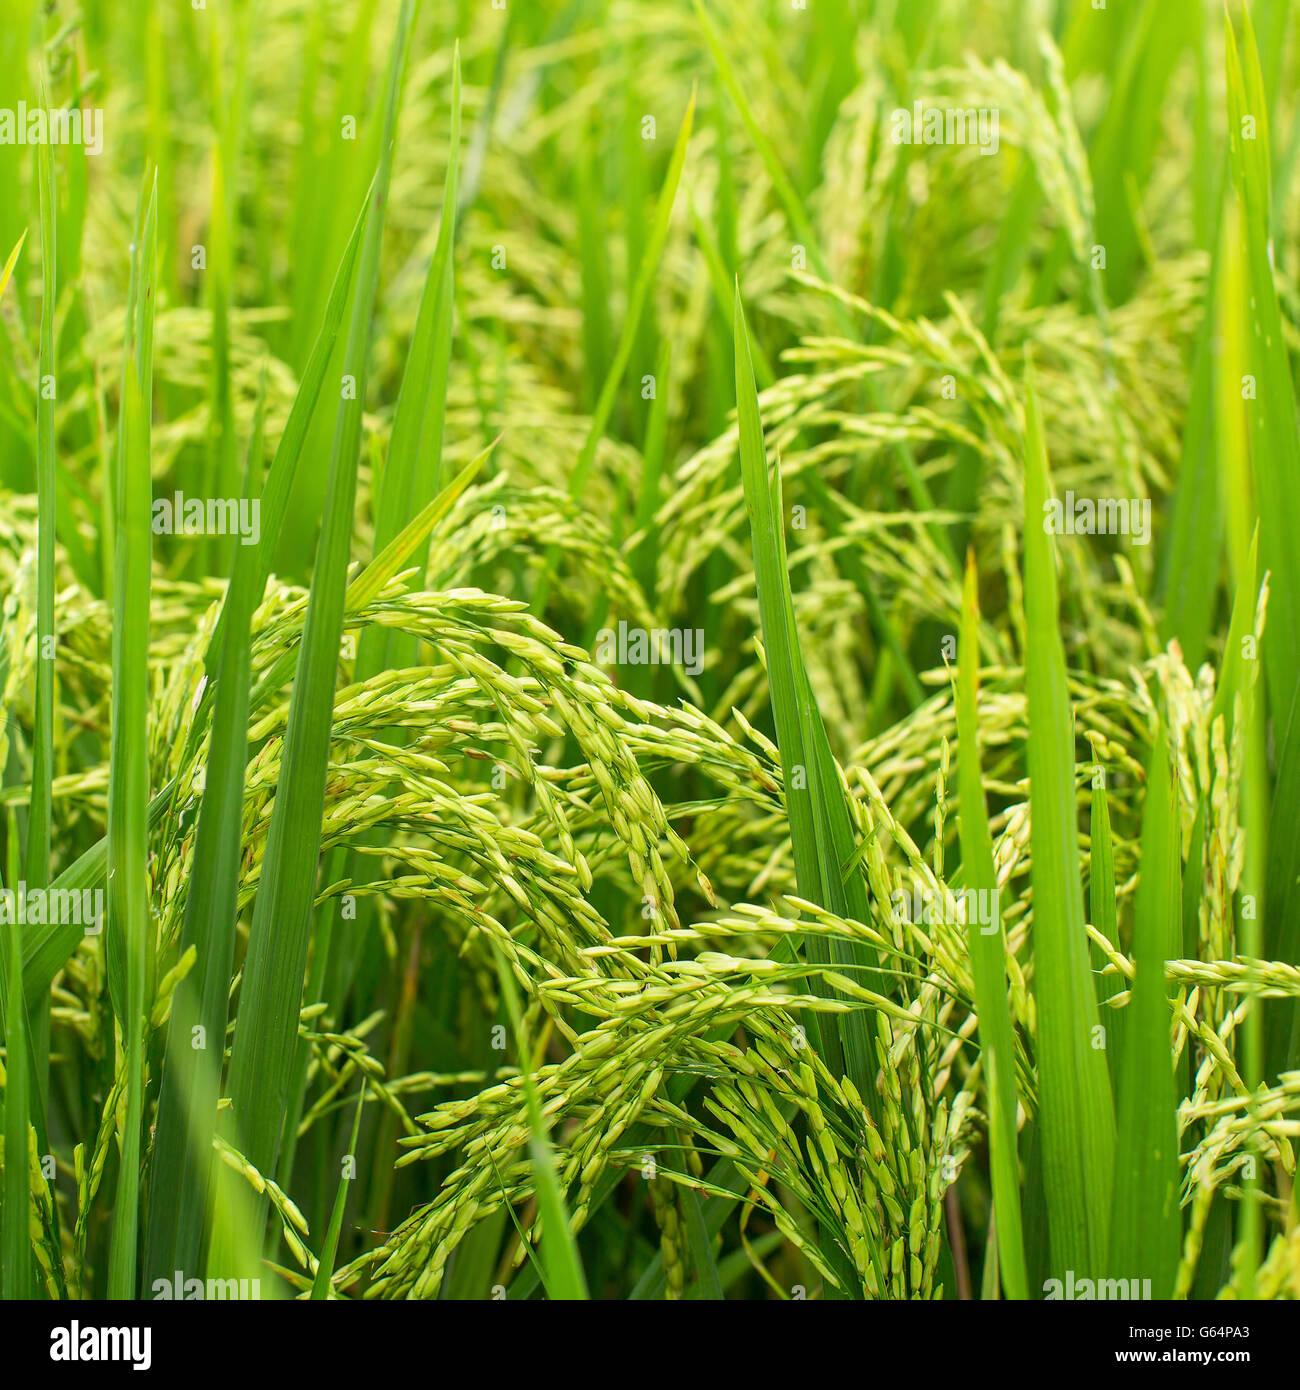 Ears of corn closeup on green rice field. - Stock Image